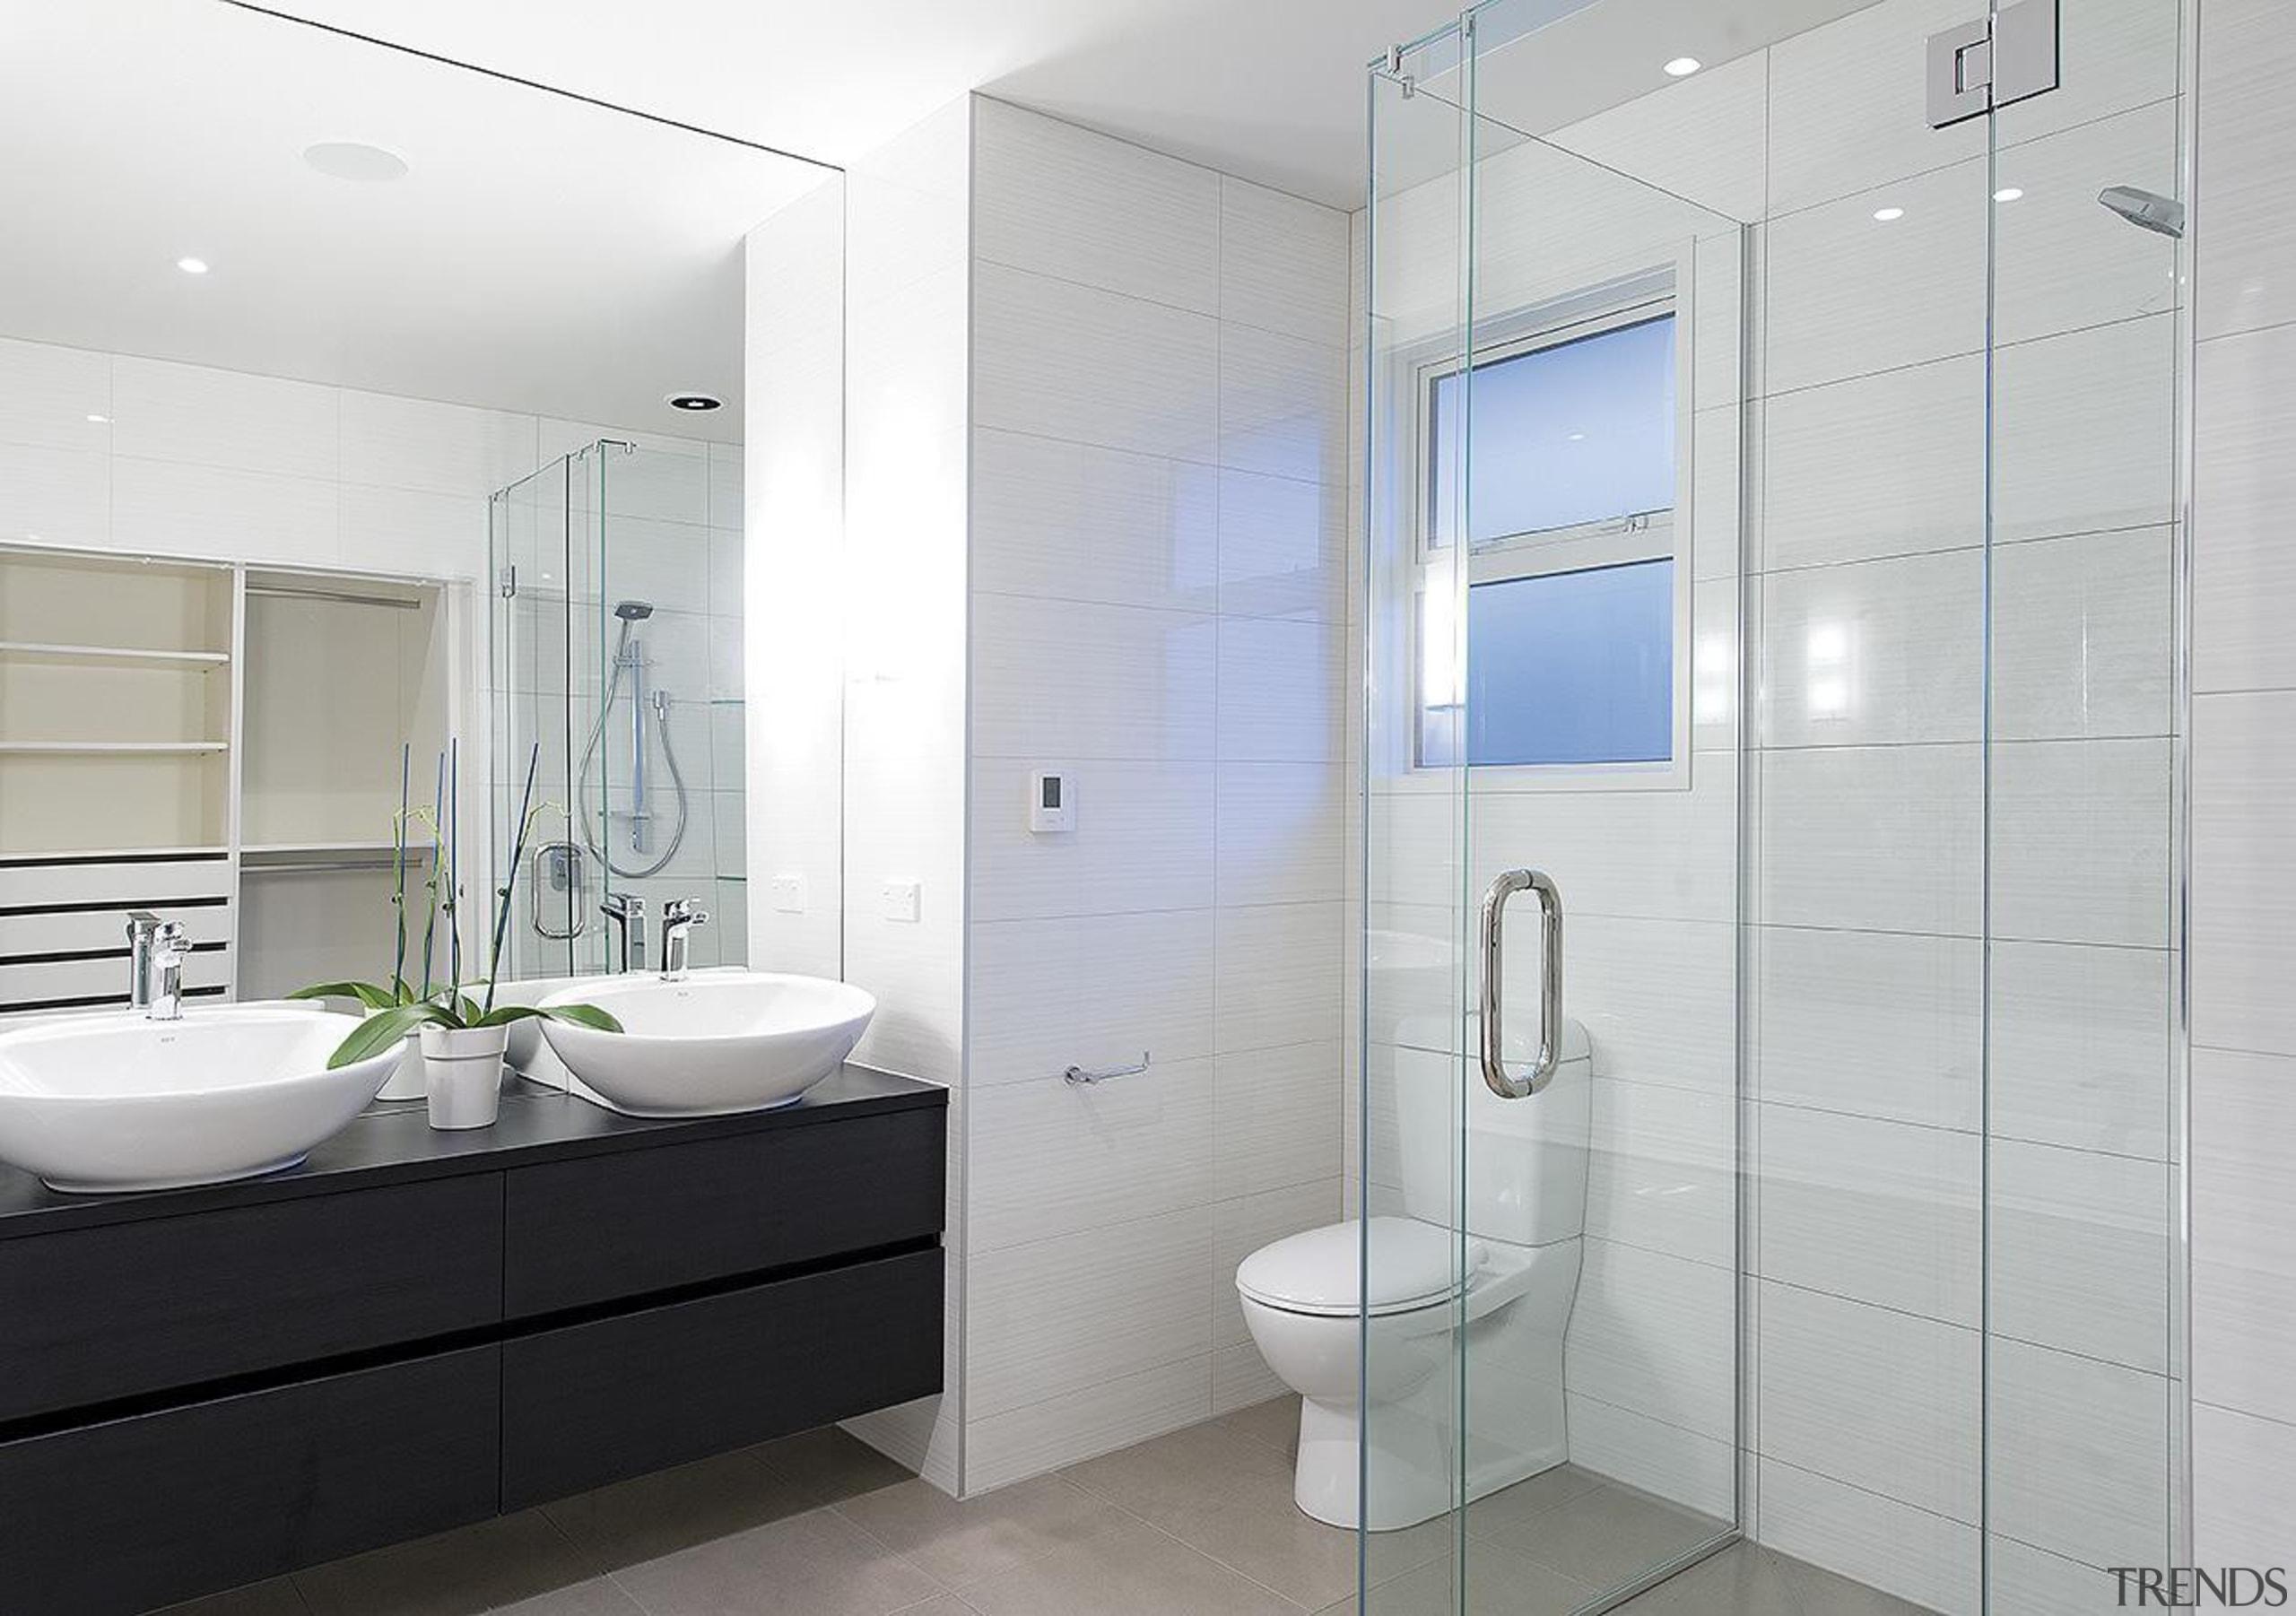 For more information, please visit www.gjgardner.co.nz bathroom, bathroom accessory, bathroom cabinet, floor, home, interior design, plumbing fixture, product design, room, tap, gray, white